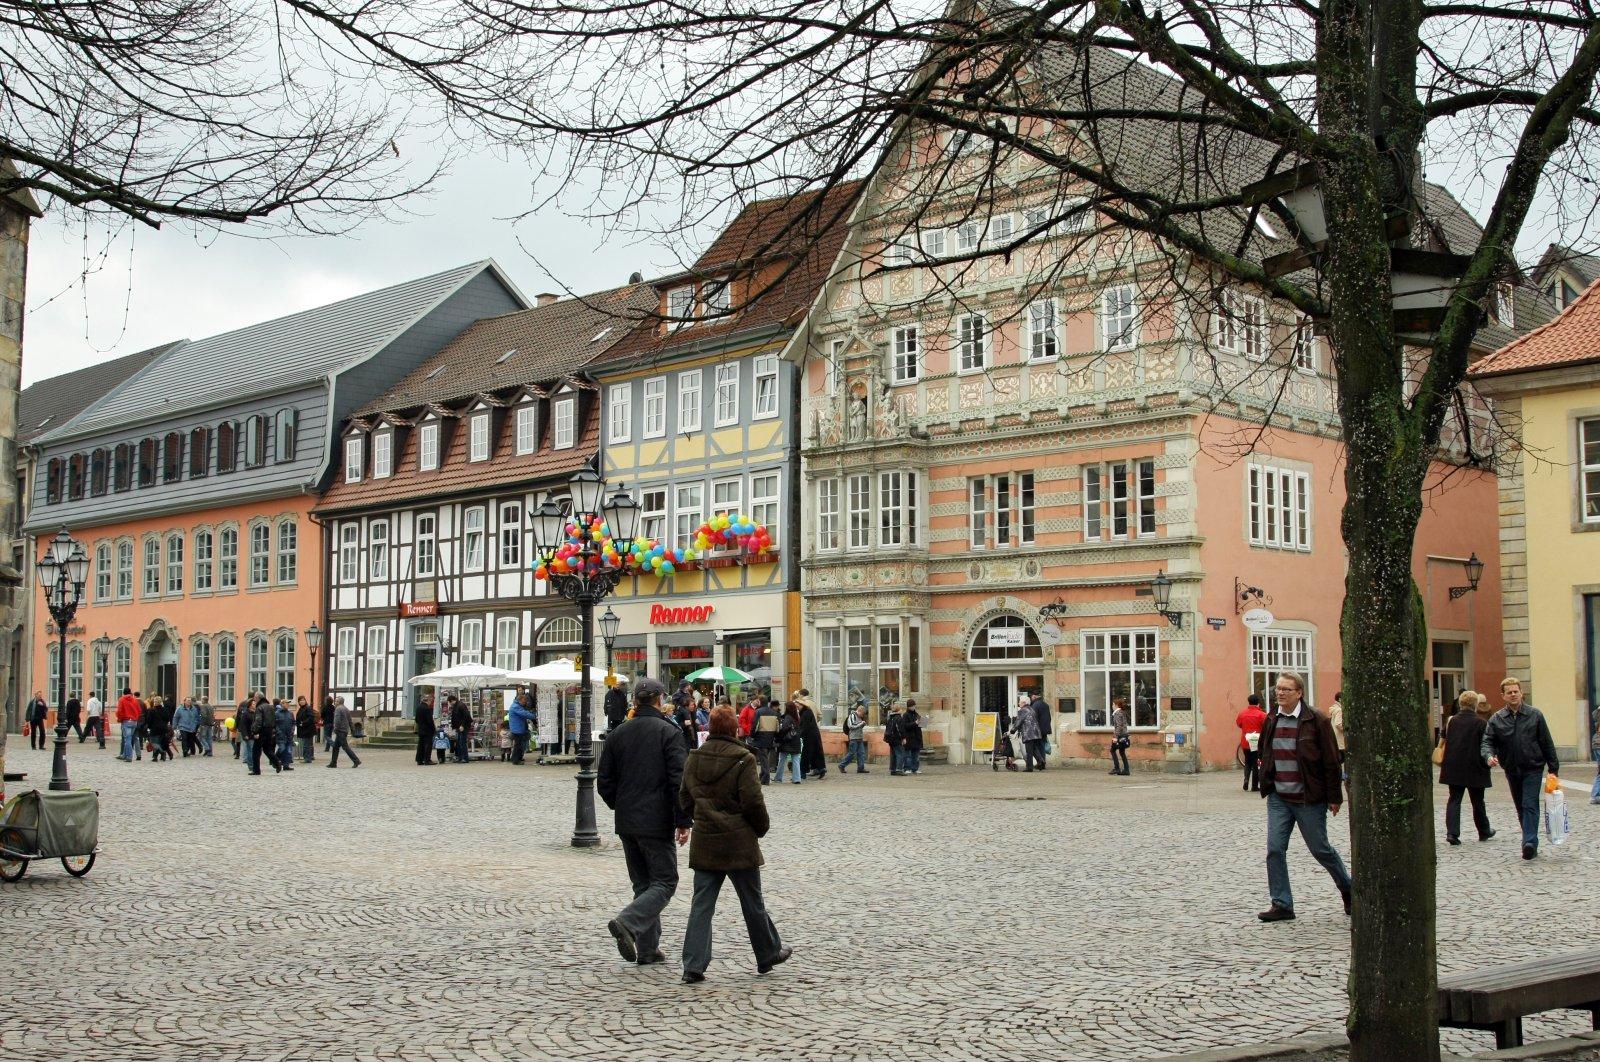 The city of Hamelin, Germany (Shutterstock Photo)